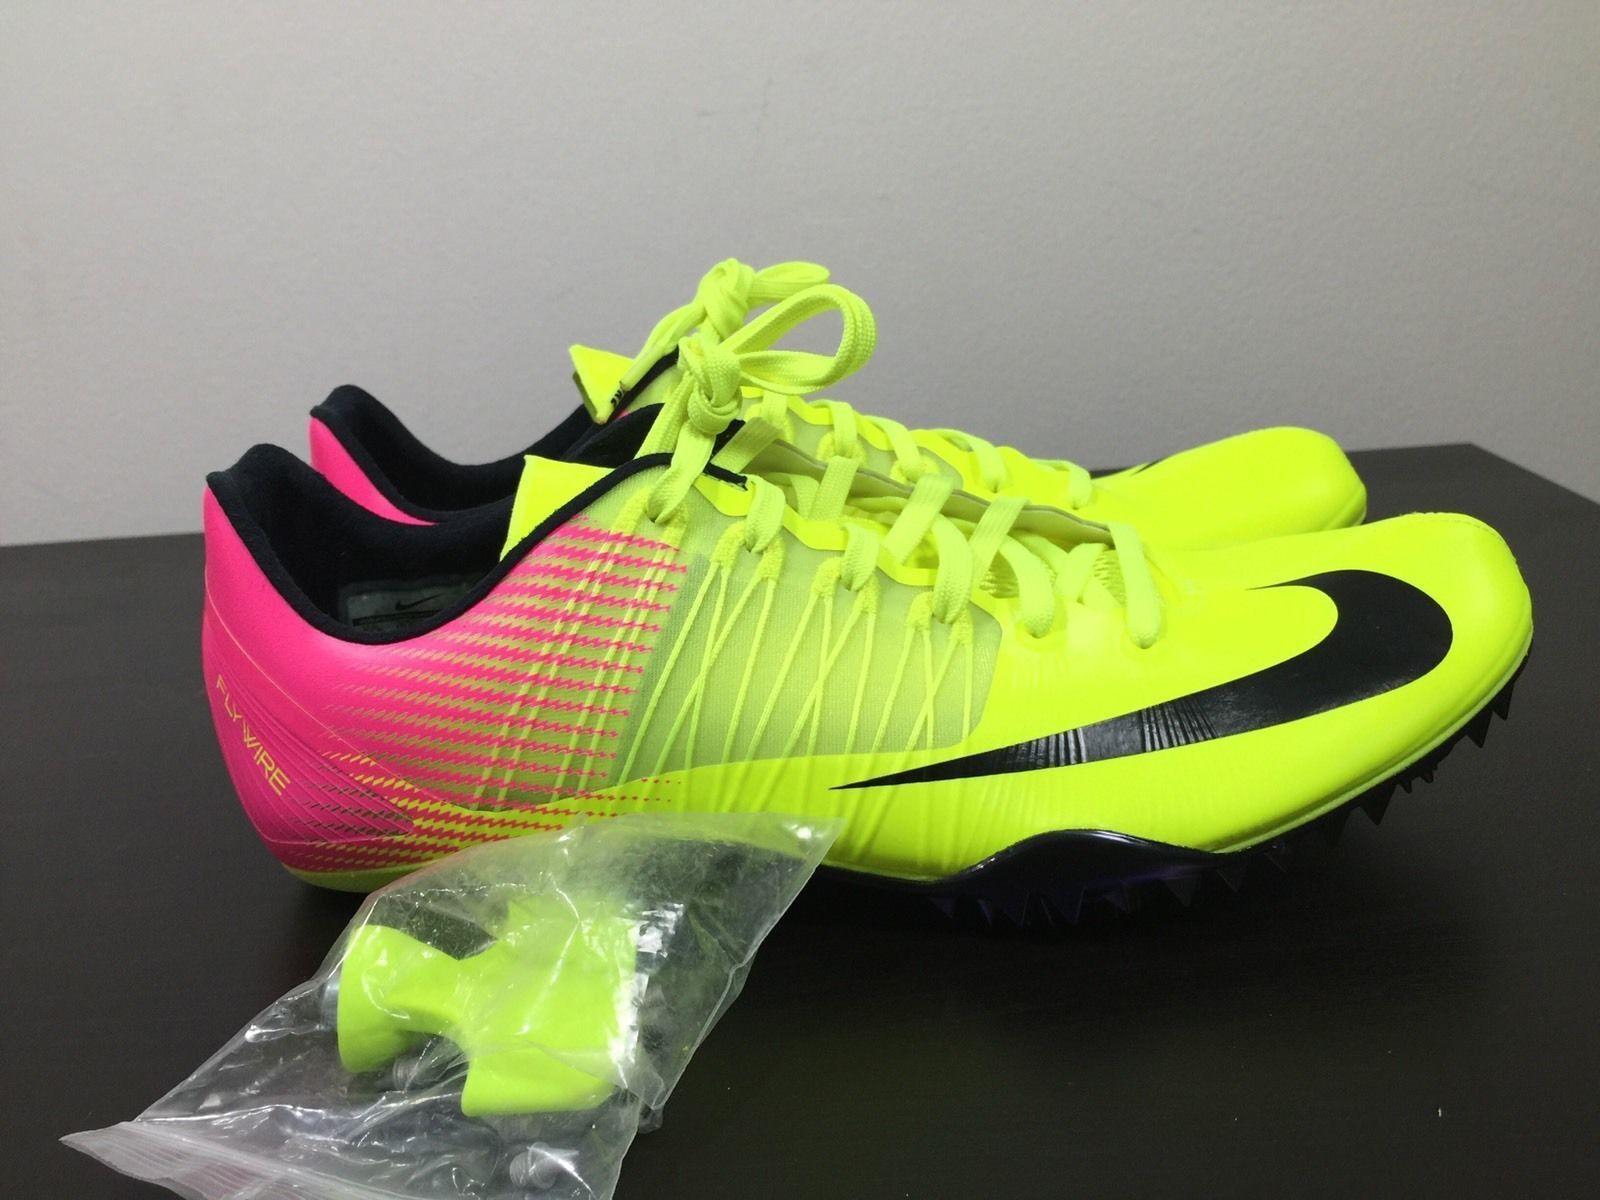 New Mens Nike Zoom Celar 5 Spikes Running Shoes Volt Pink Blk 629226-999 Sz 11.5